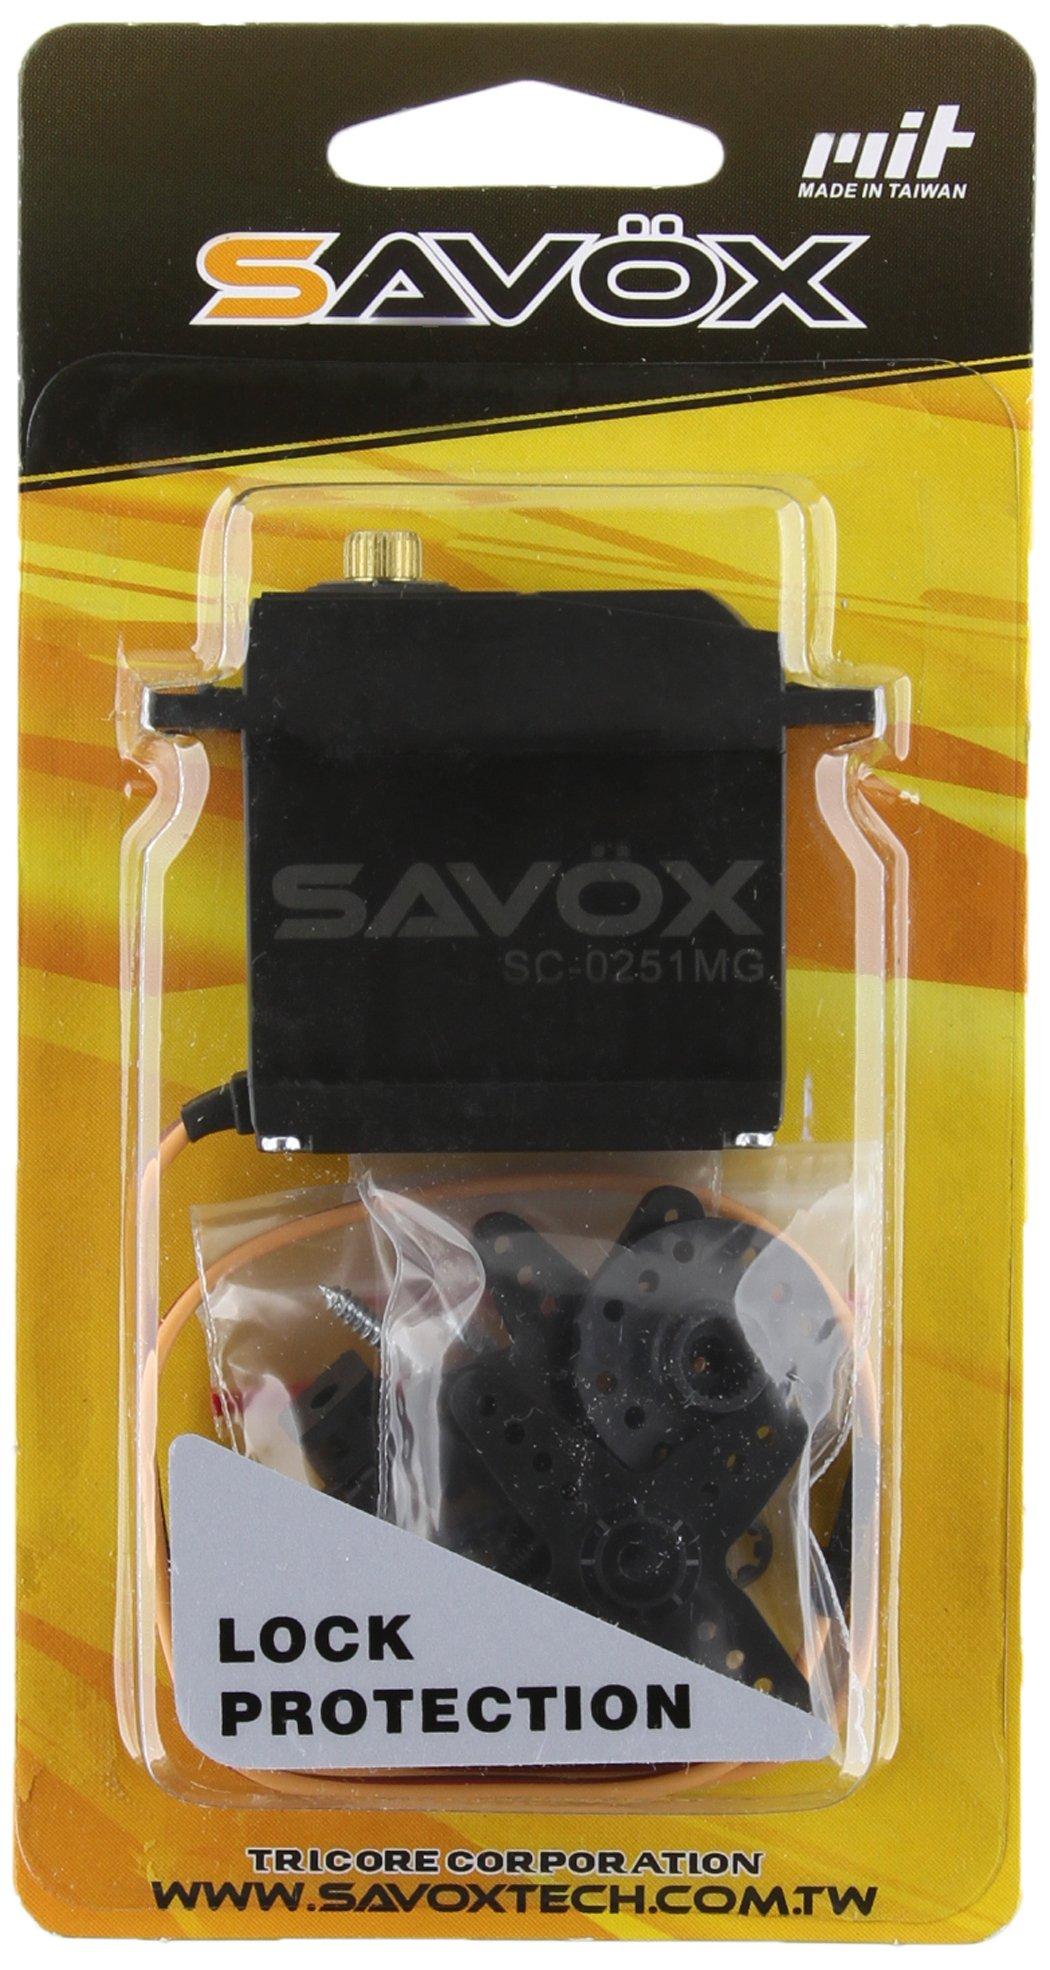 Savox SC-0251 High Torque Metal Gear Larger than Standard Digital Servo